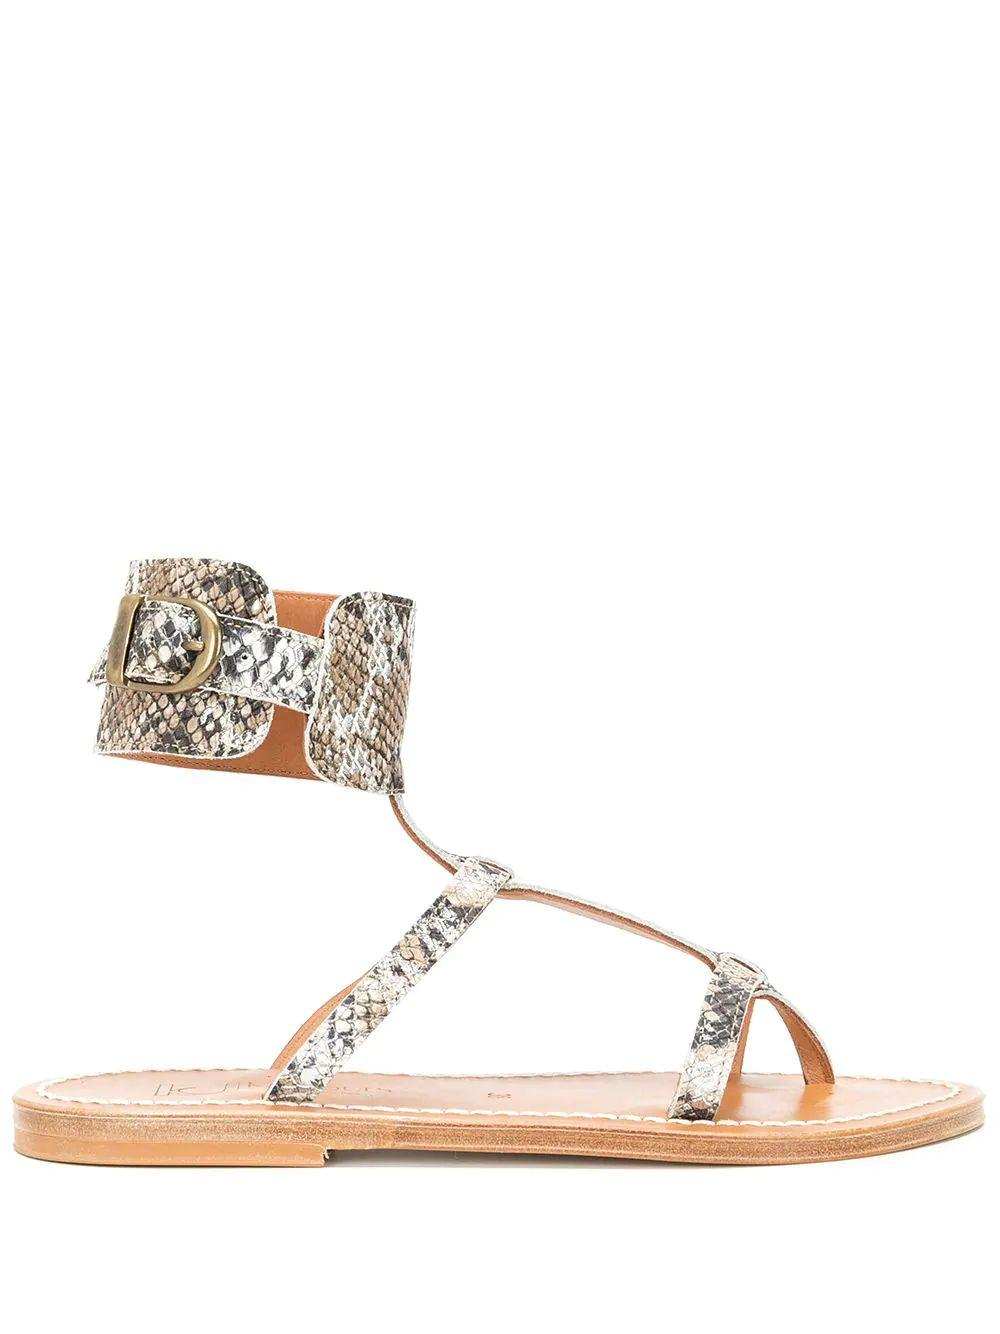 Caravelle Gladiator Sandal Item # CARAVELLE